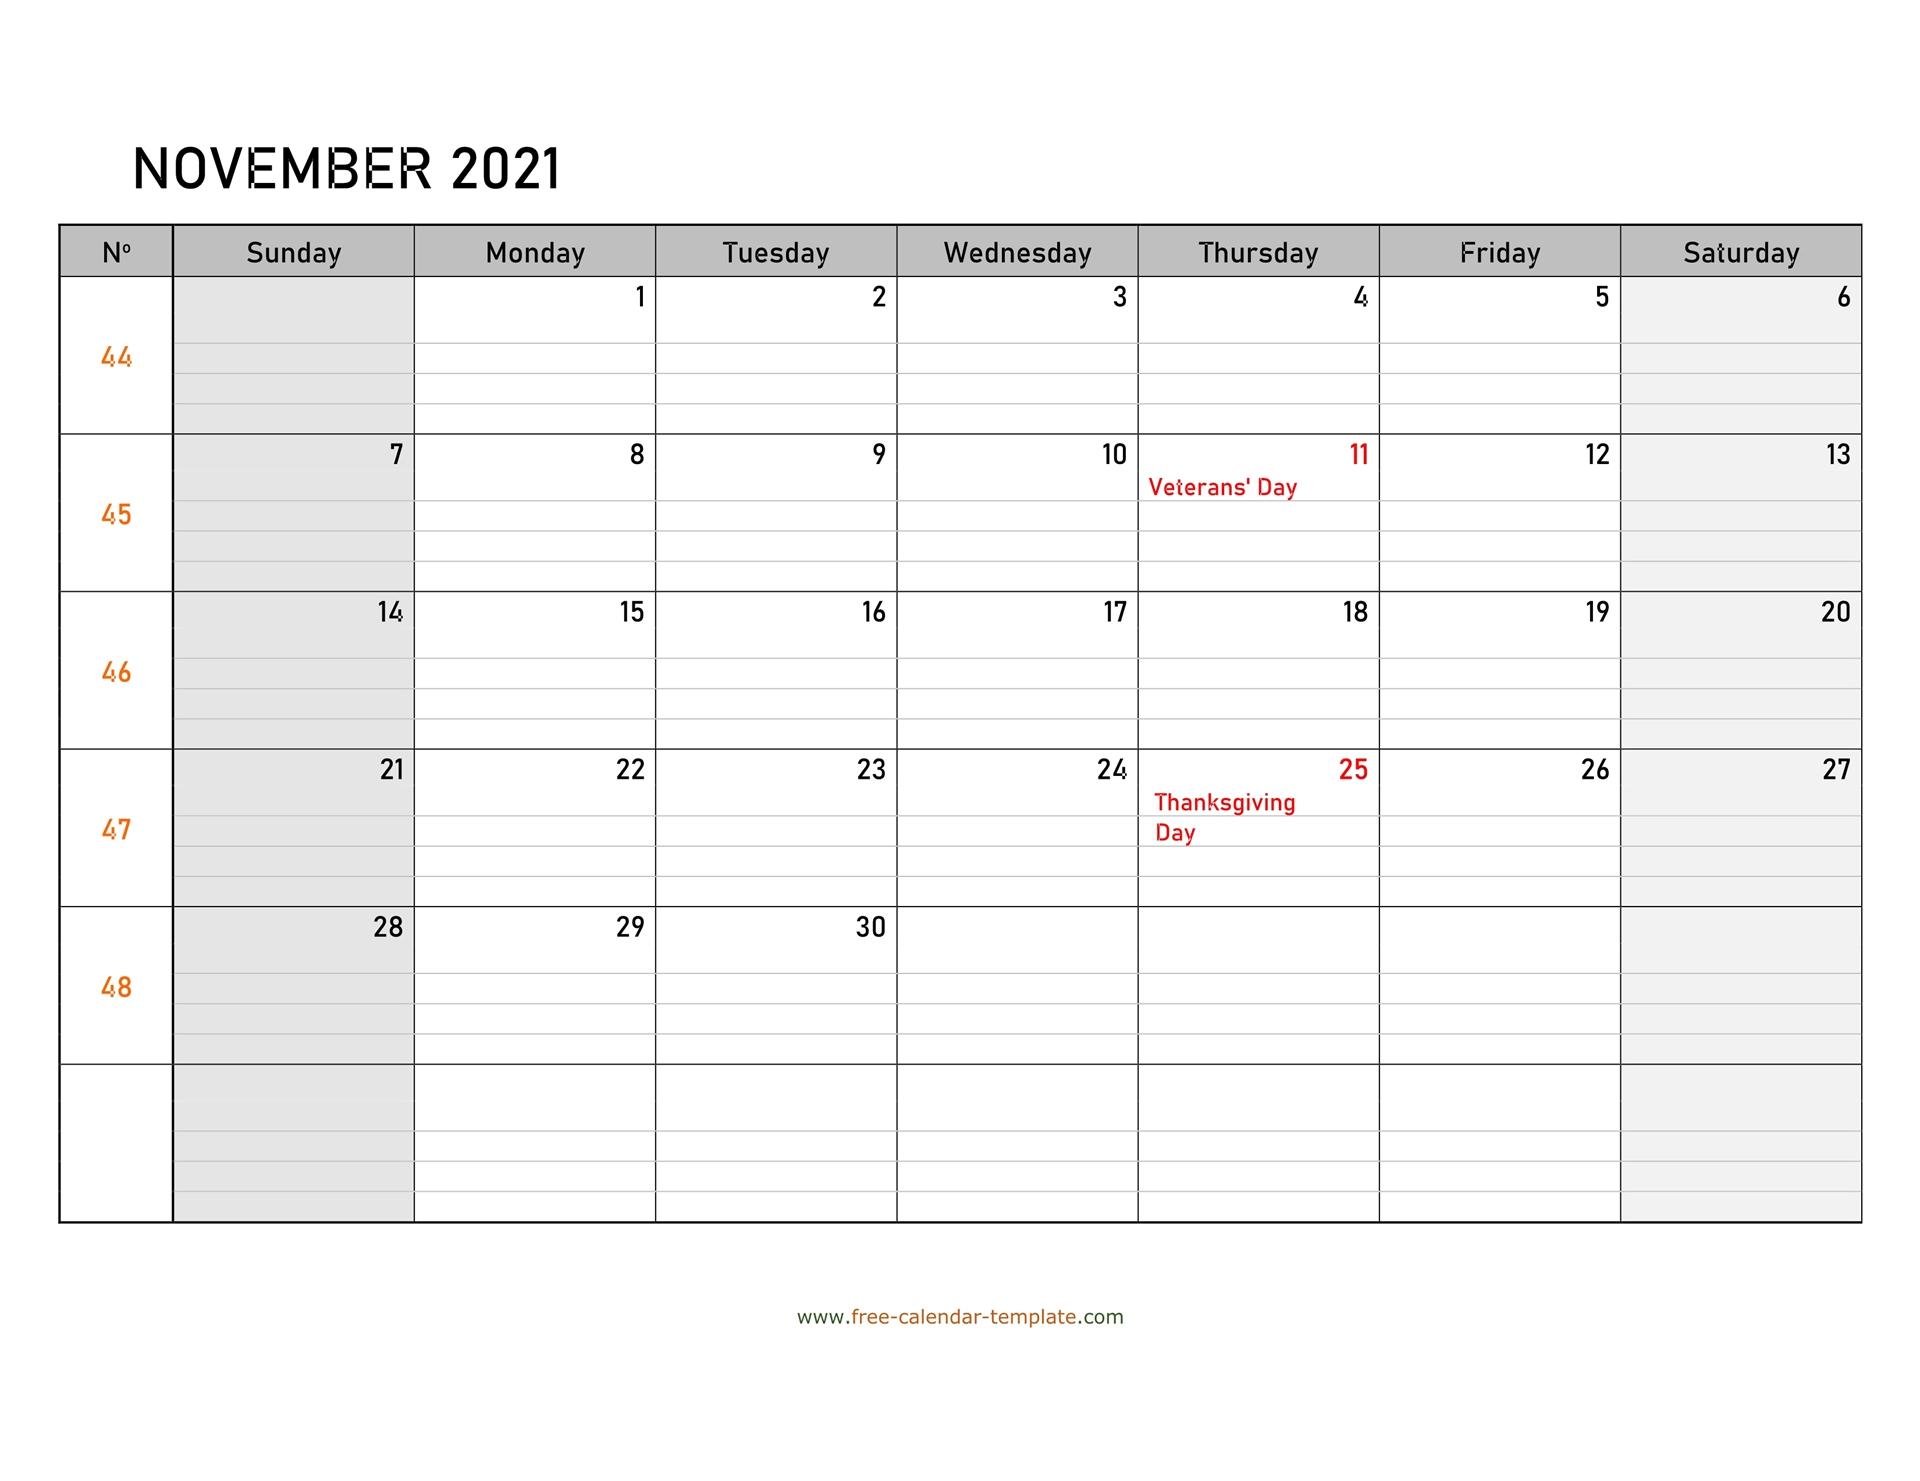 November 2021 Calendar Free Printable With Grid Lines